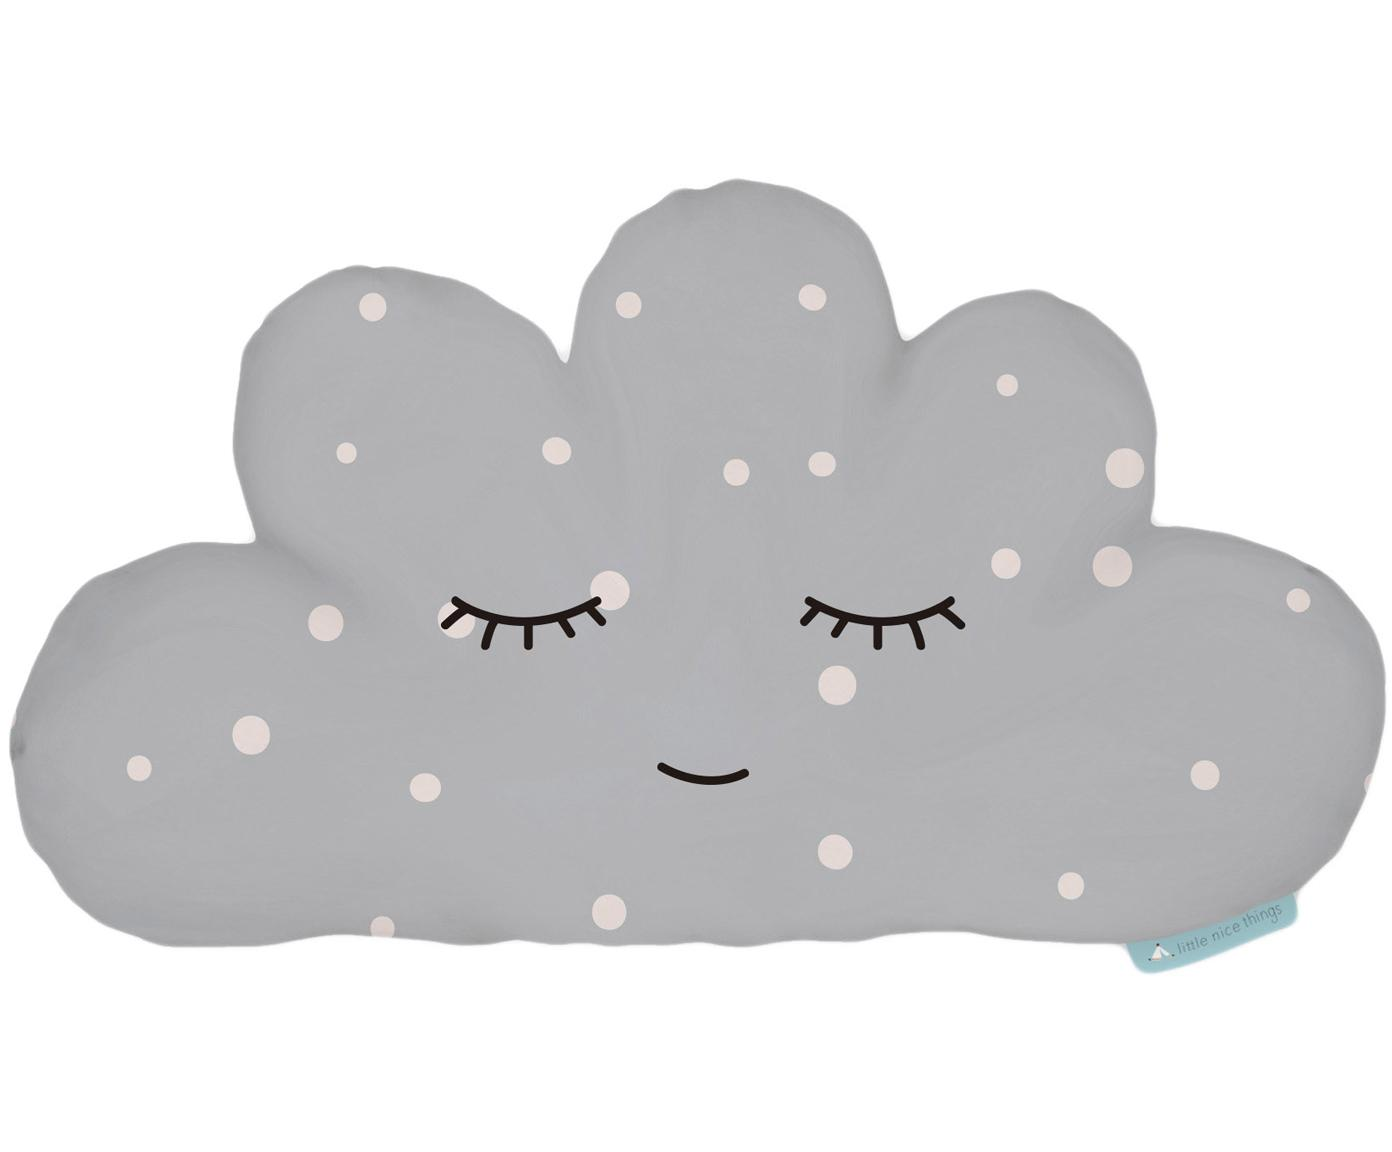 Knuffelkussen Cloud, Polyester (microvezels), Grijs, wit, zwart, 21 x 42 cm